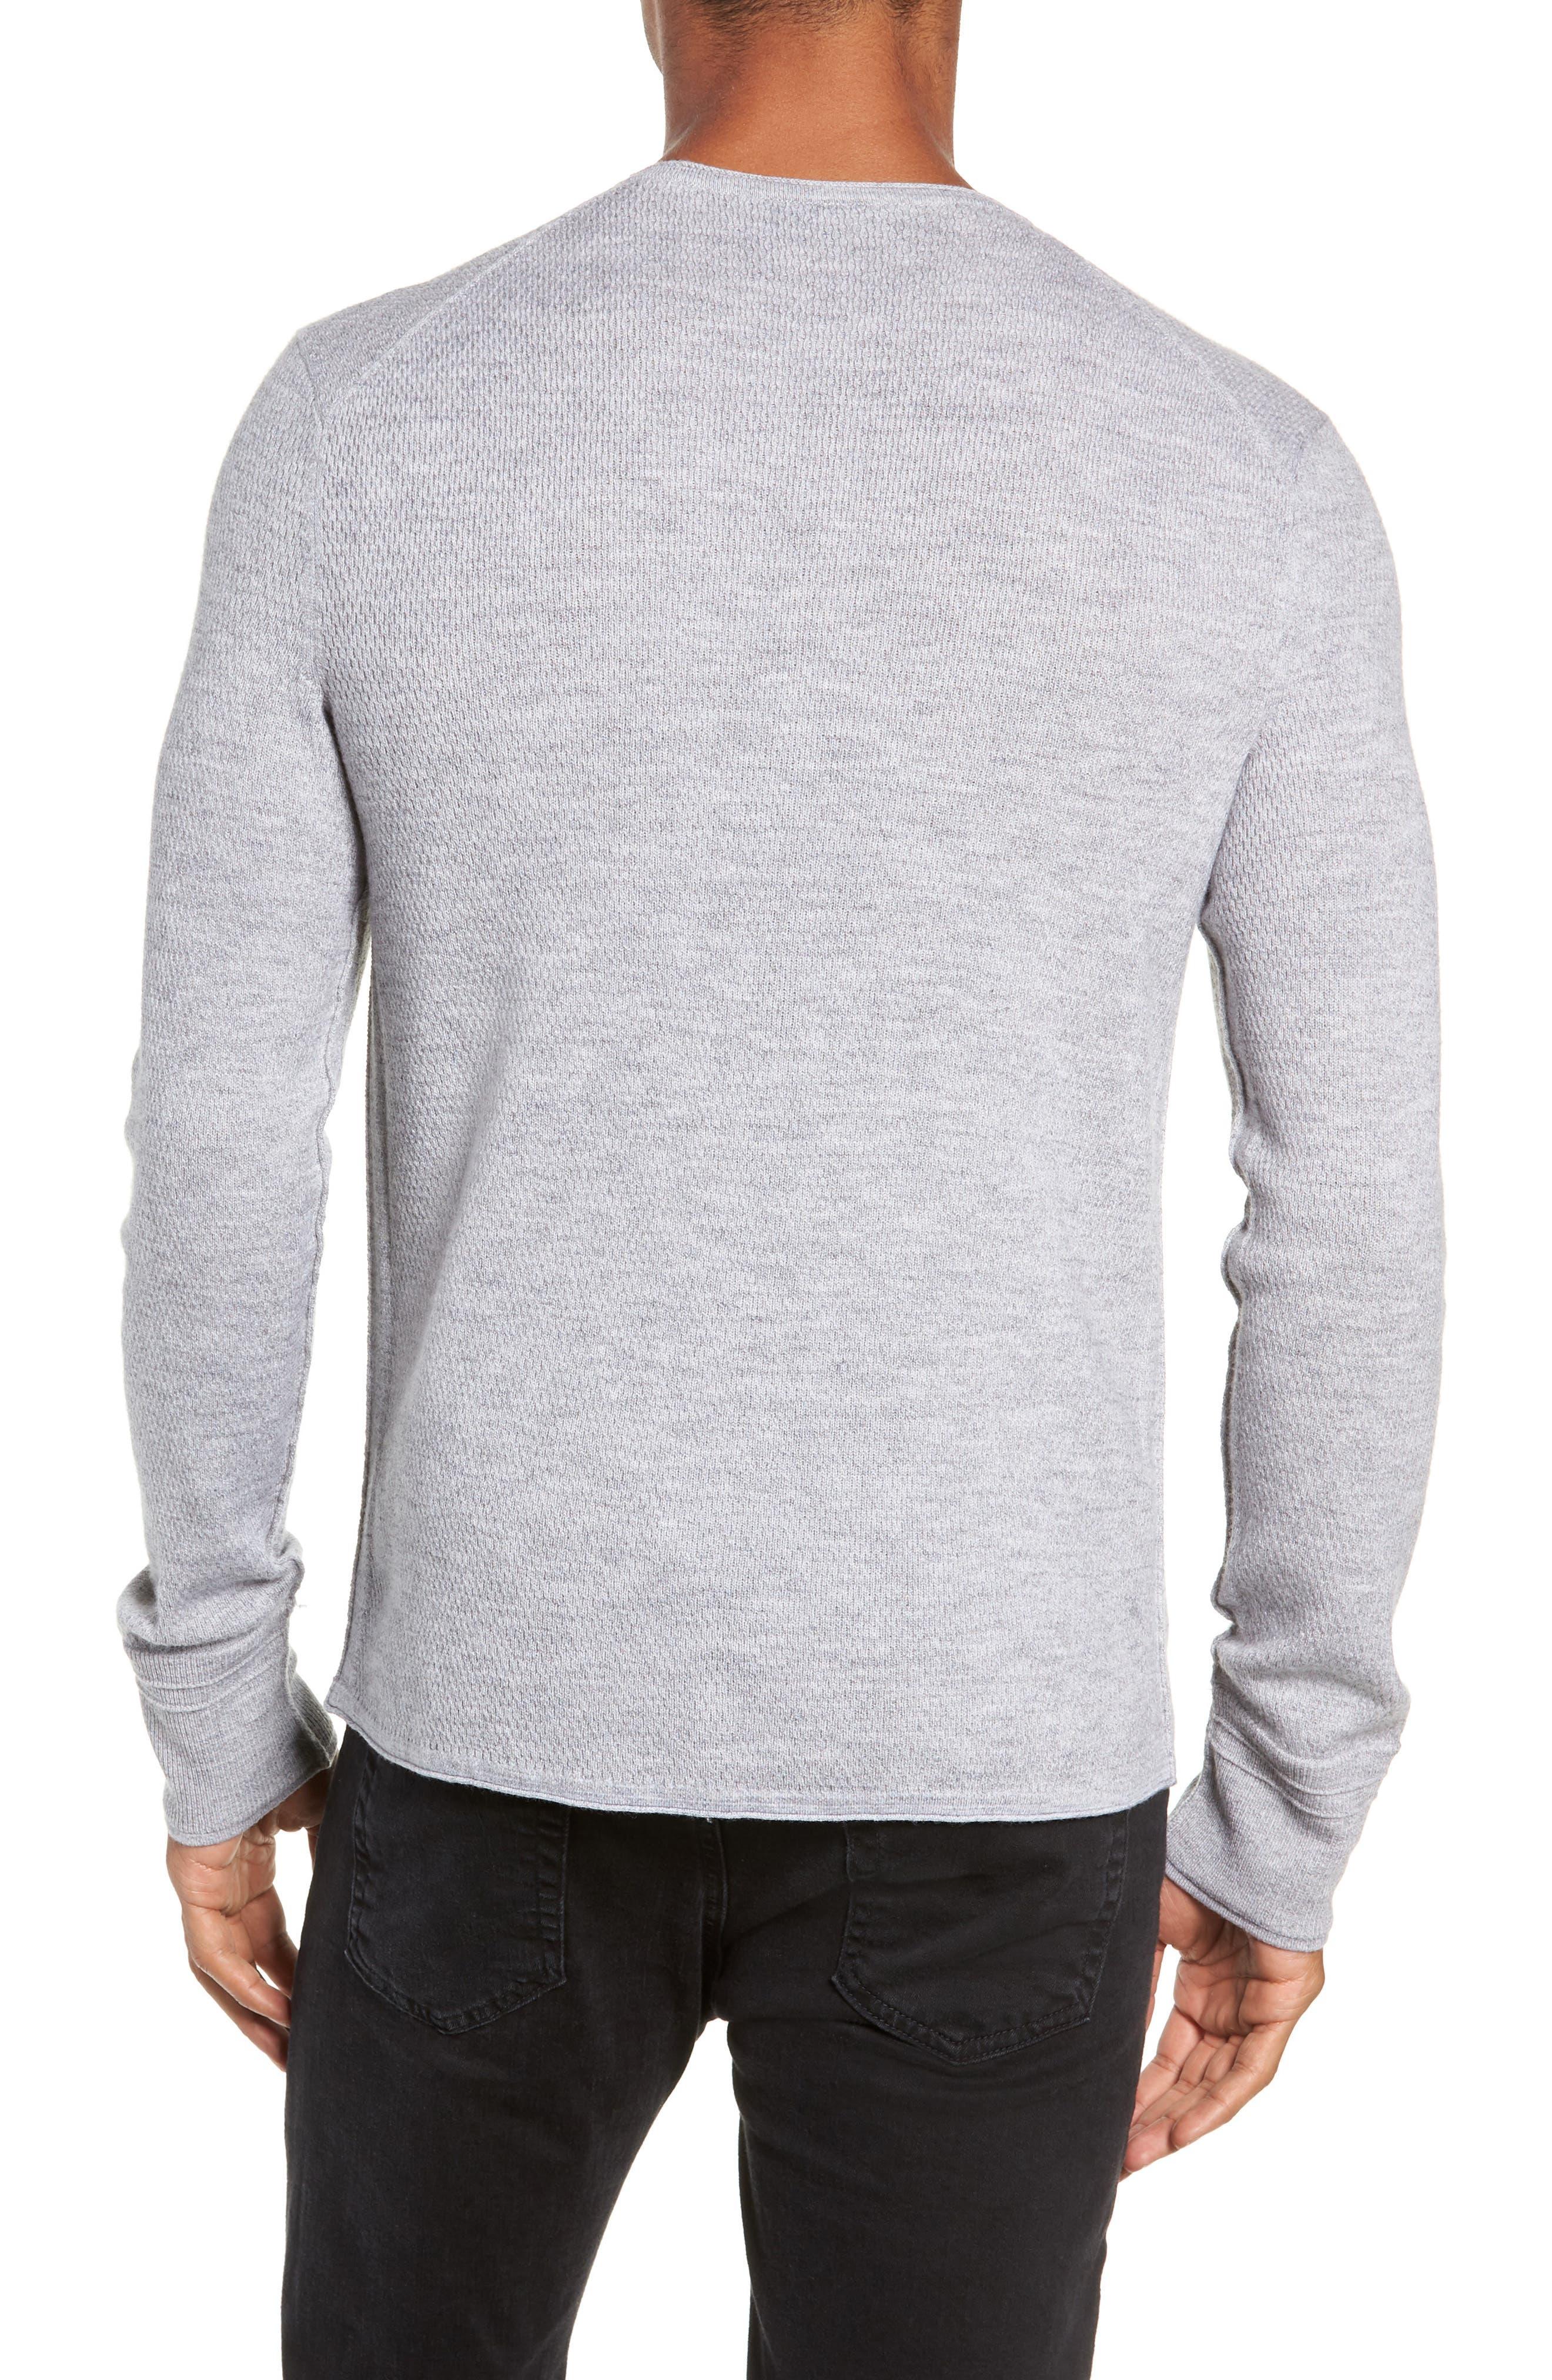 Gregory Merino Wool Blend Crewneck Sweater,                             Alternate thumbnail 2, color,                             GREY